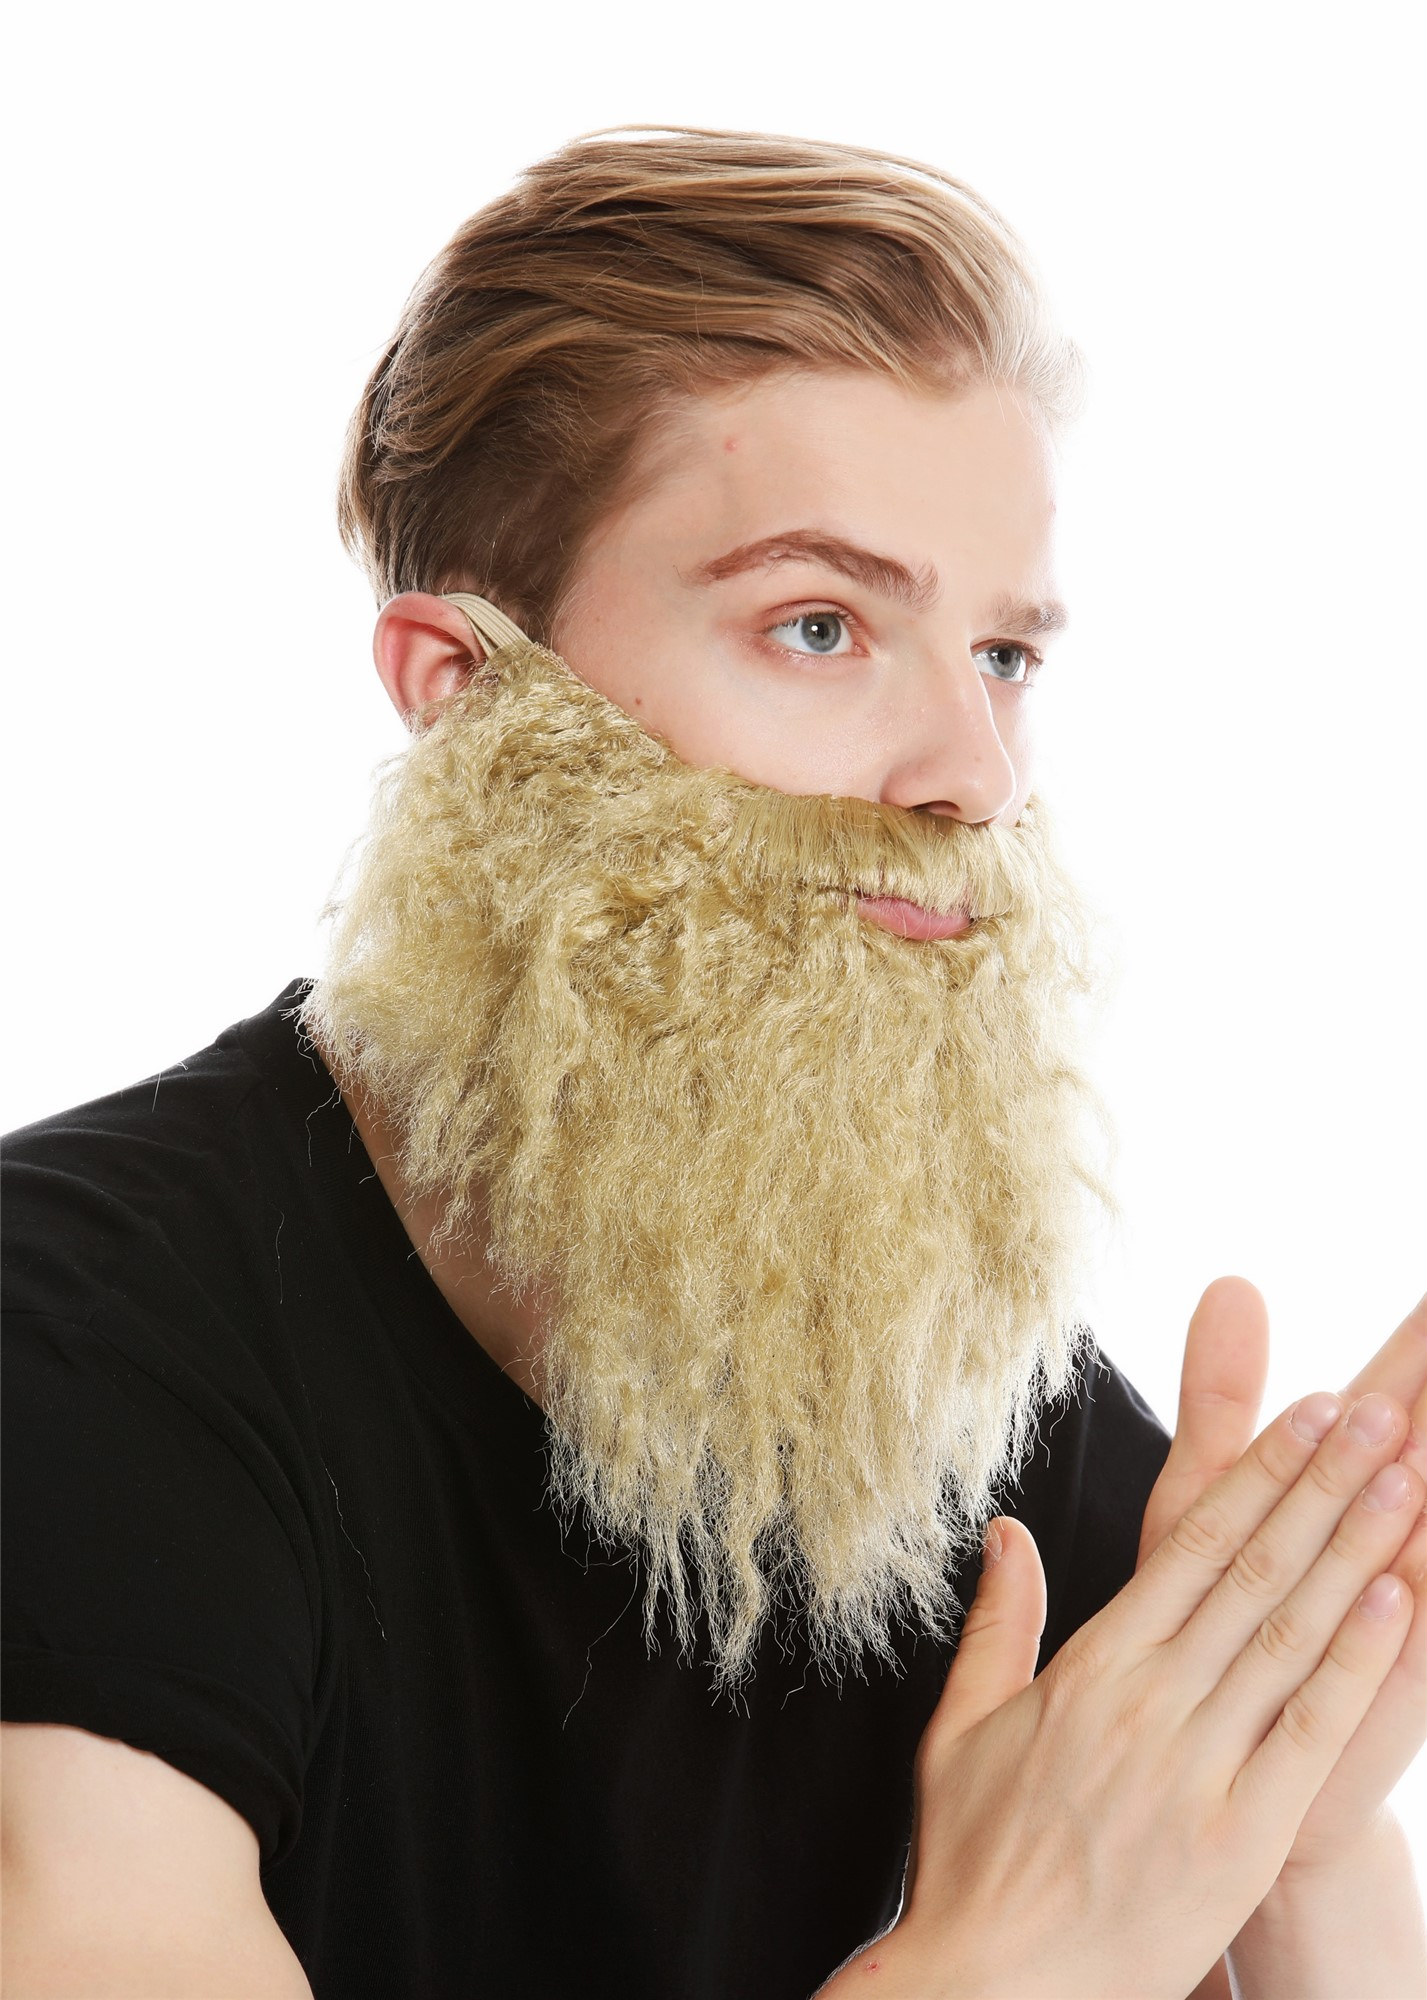 Bart Vollbart Blond Räuber Prophet Hipster Modell